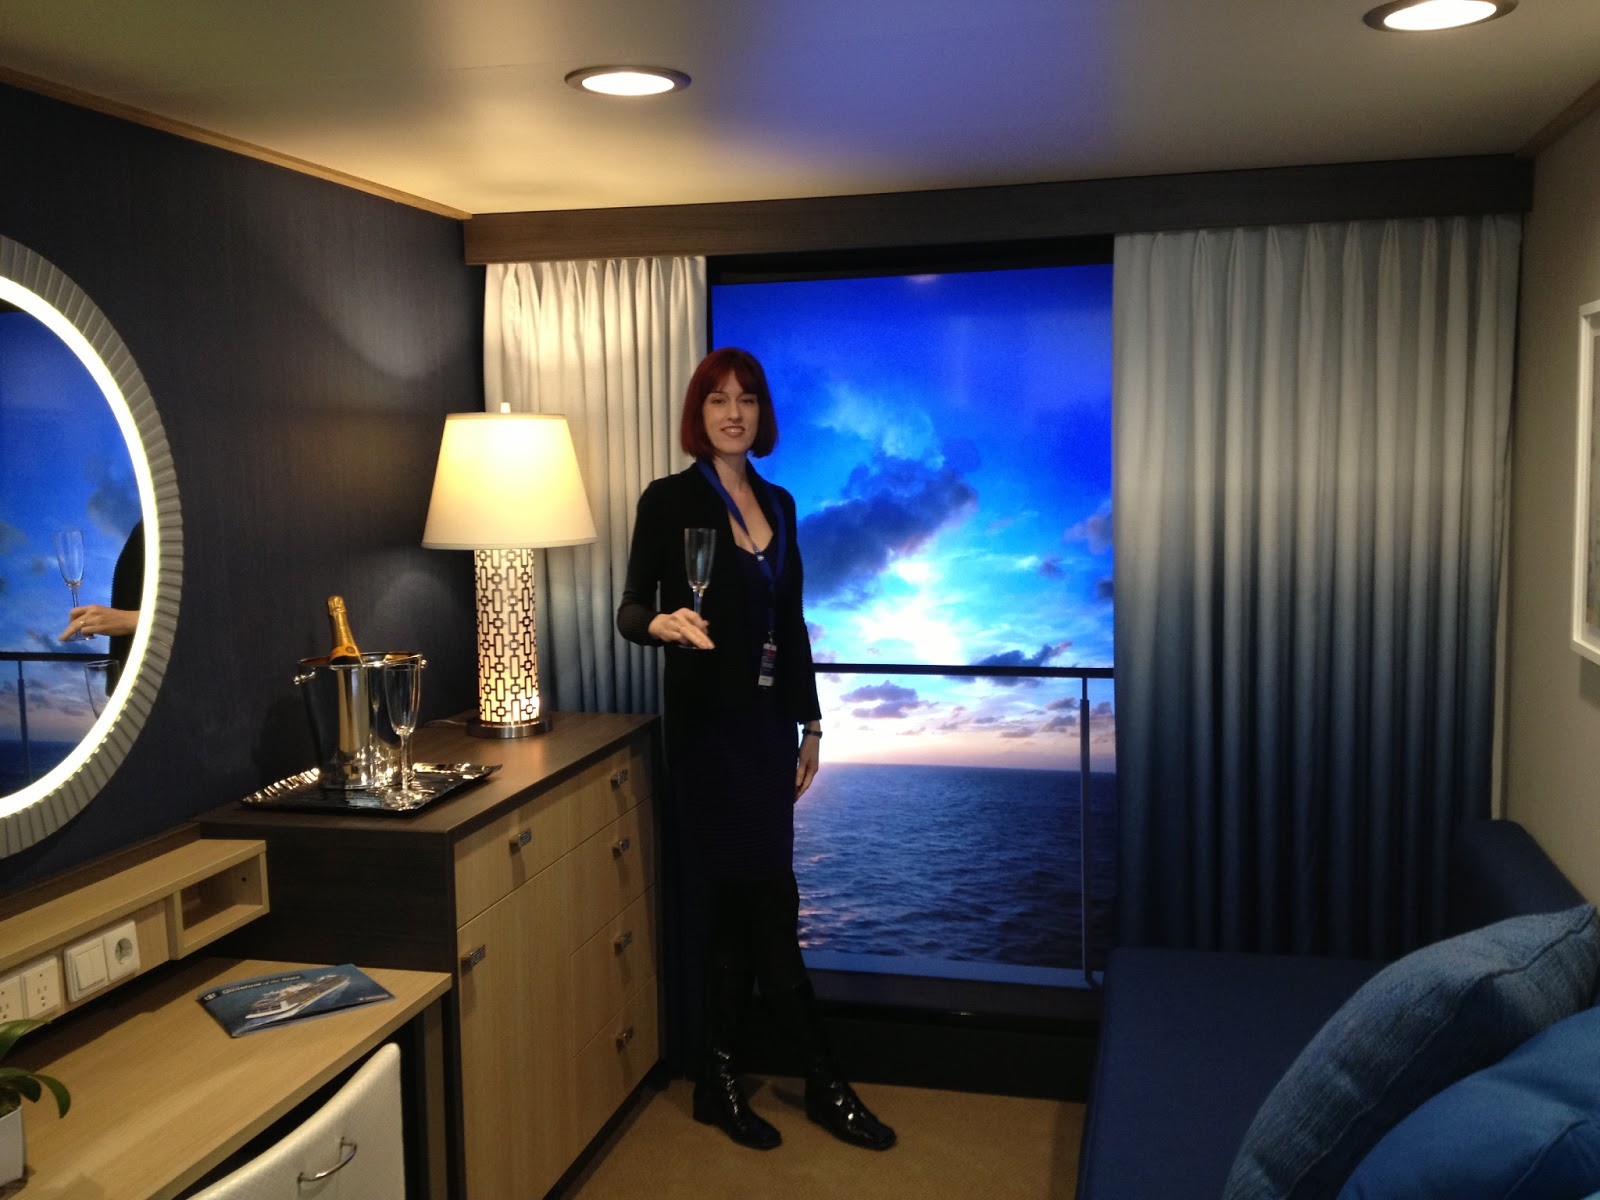 Stephanie Serino 39 S Travel Blog Royal Caribbean 39 S New Ship Quantum Of The Seas